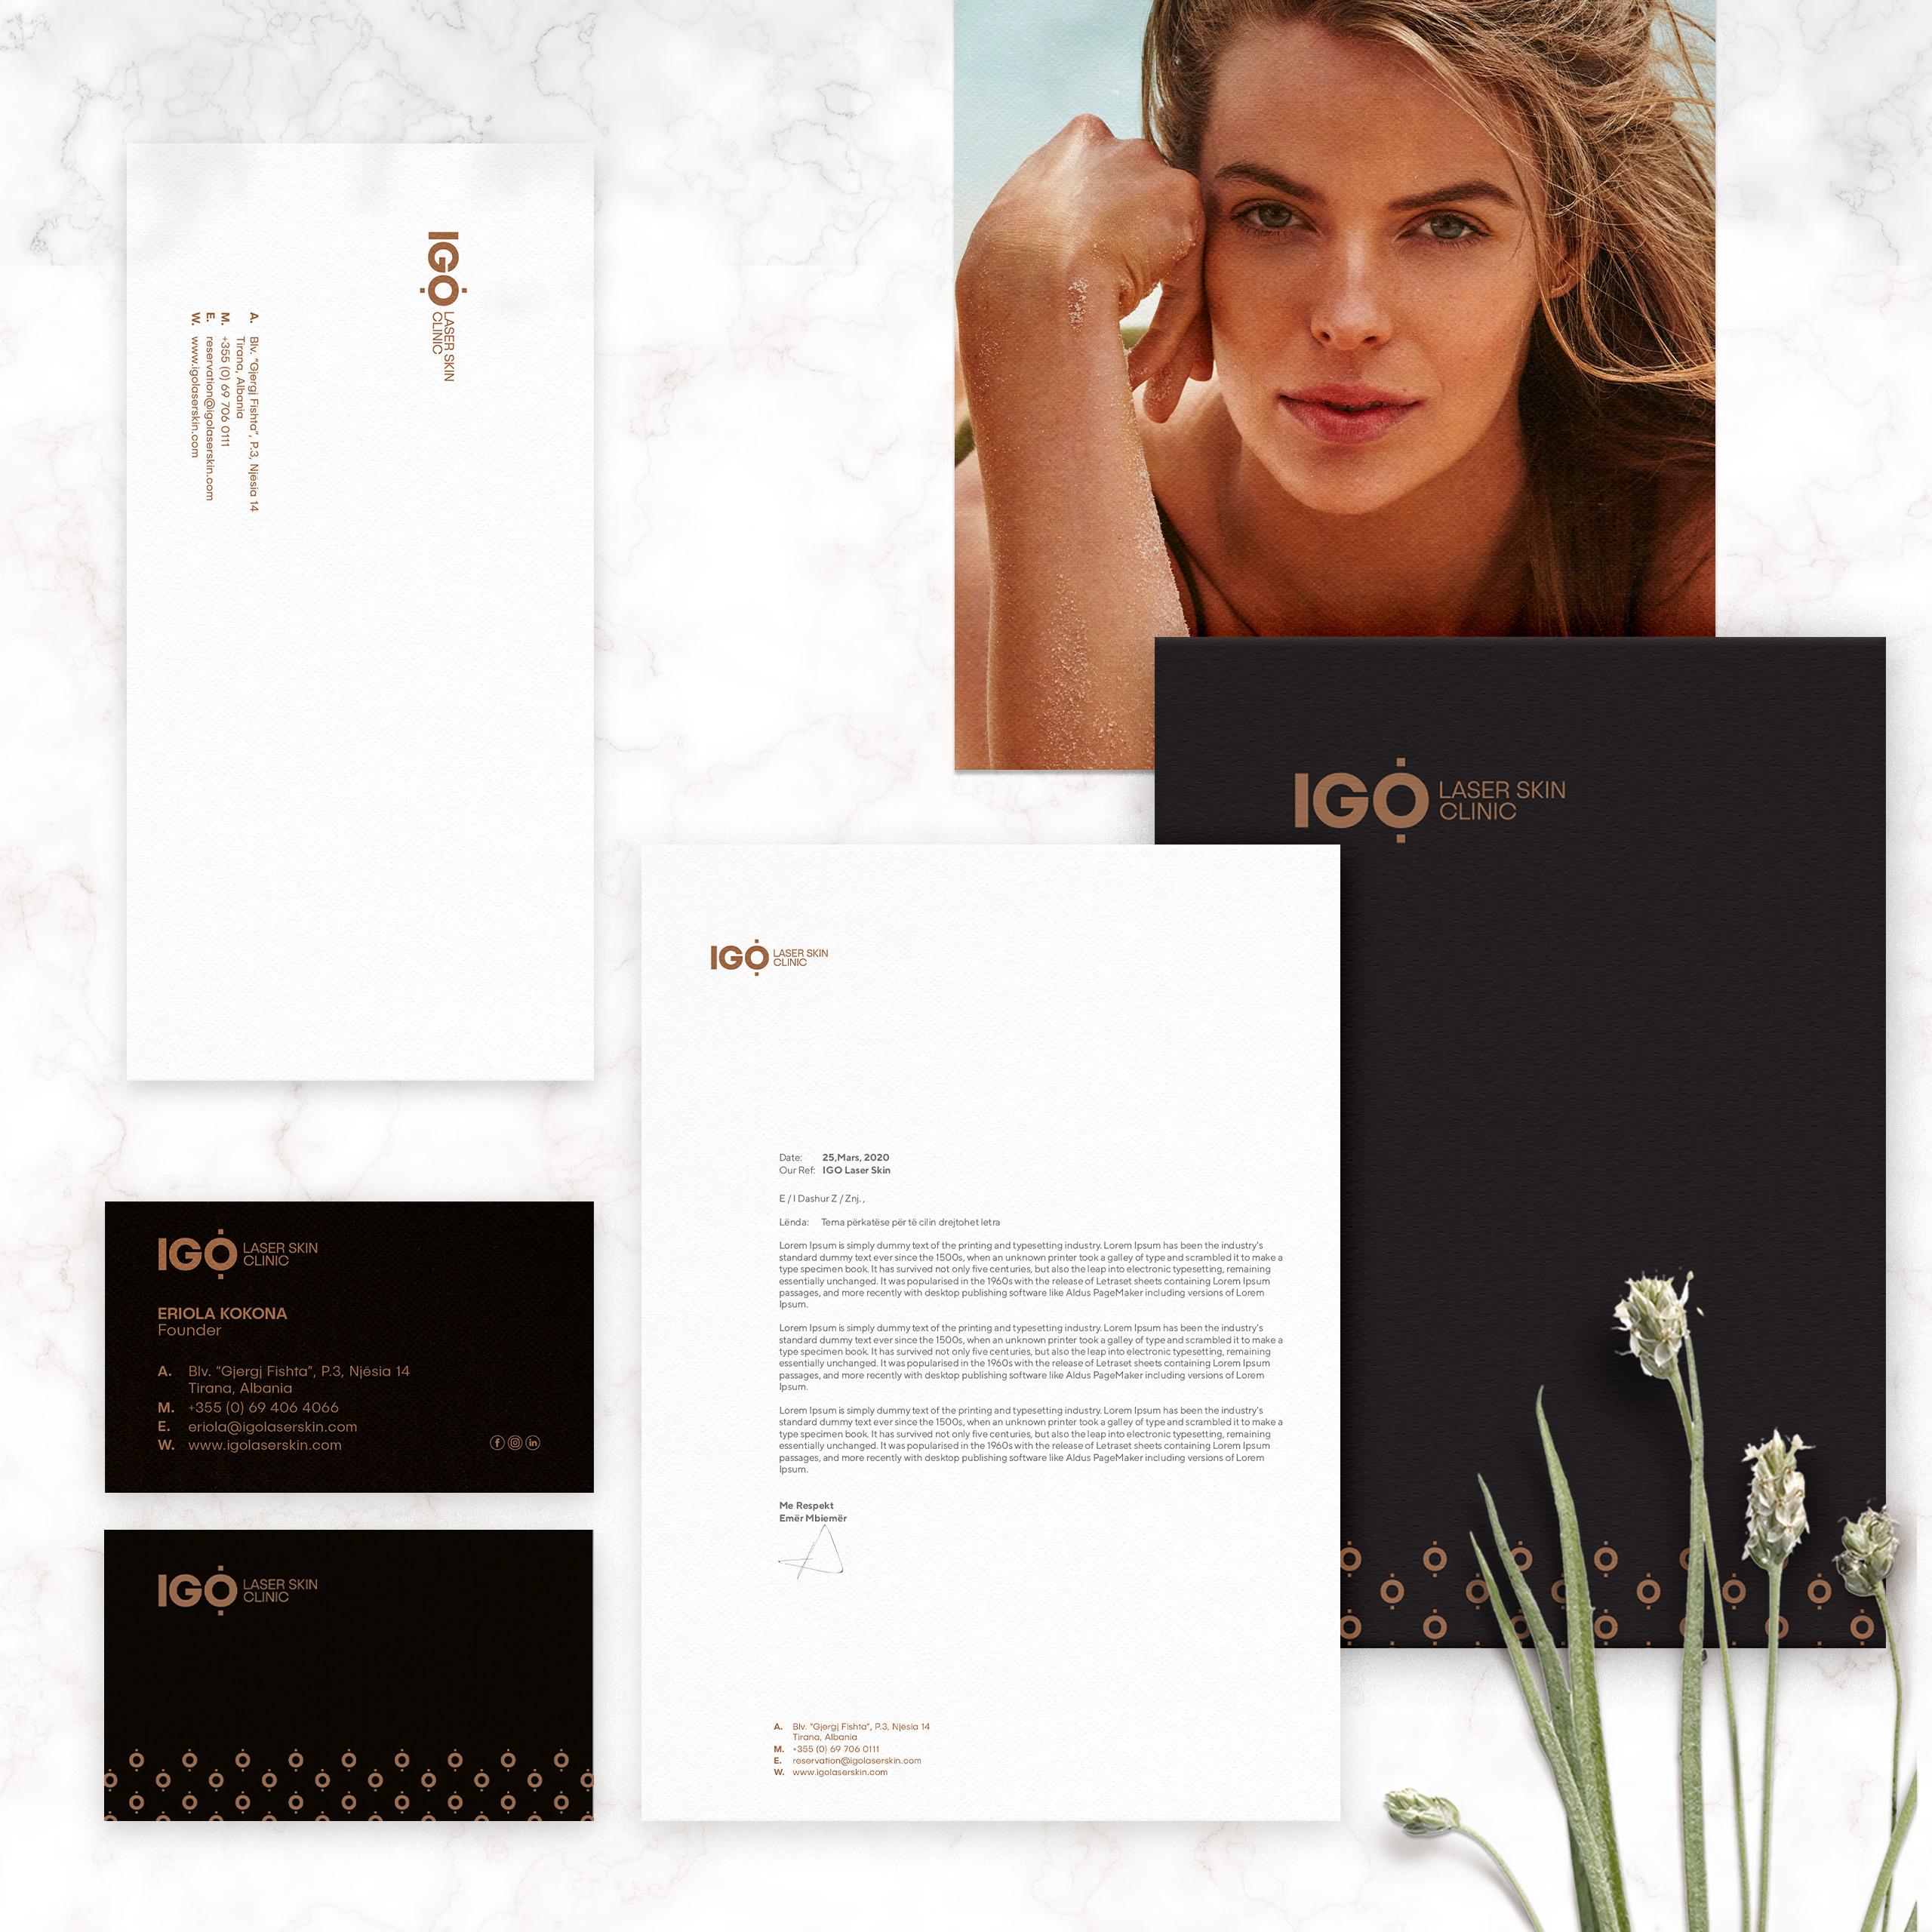 IGO Laser Skin Project Img 18 - Vatra Agency / Founder & CEO Gerton Bejo